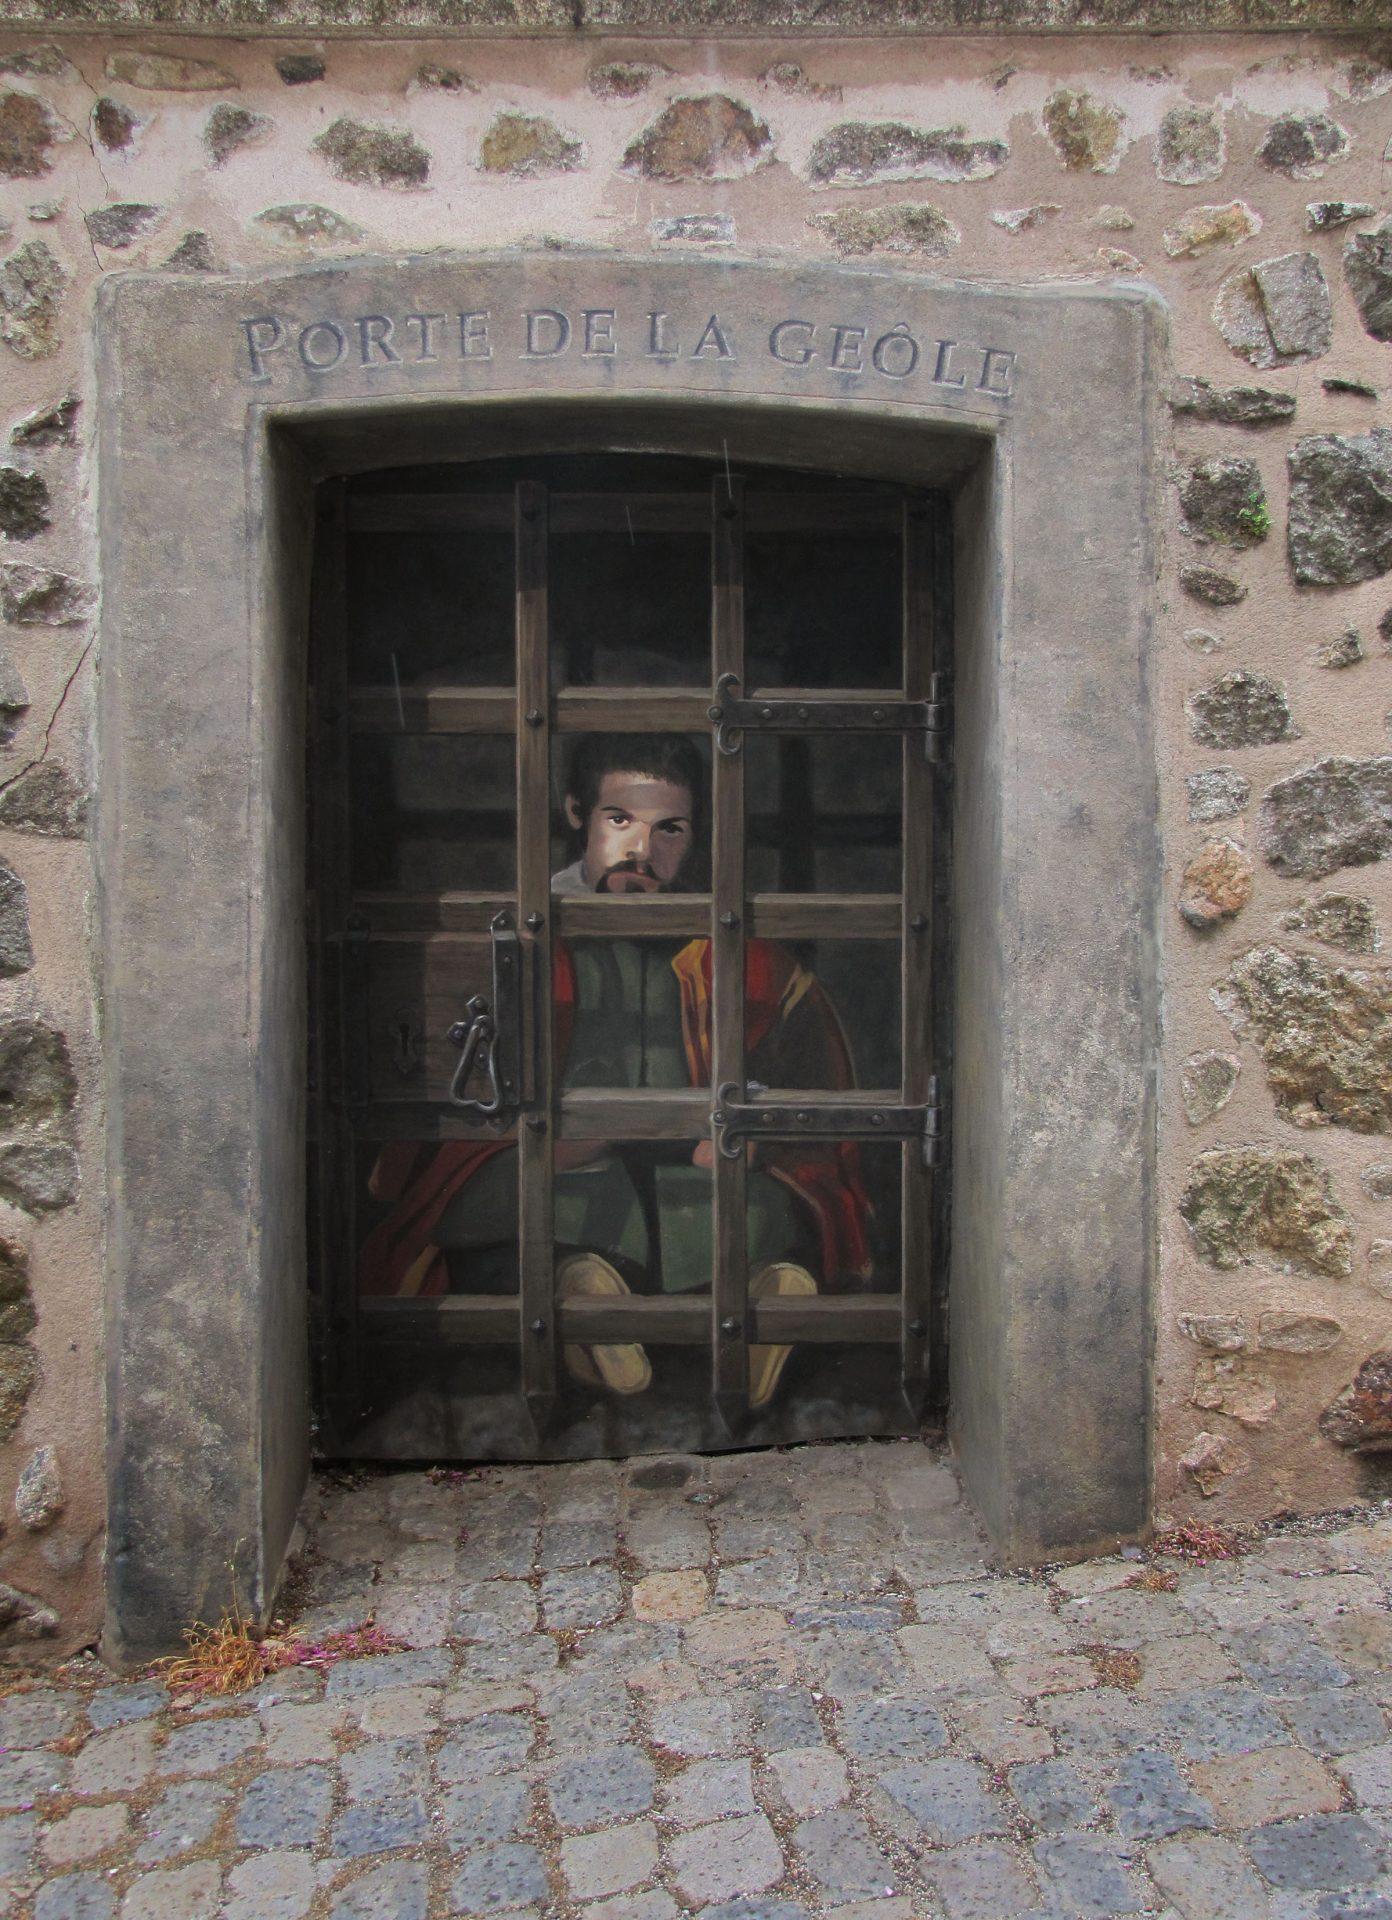 171 Porte De La Ge 244 Le 187 A Fresco